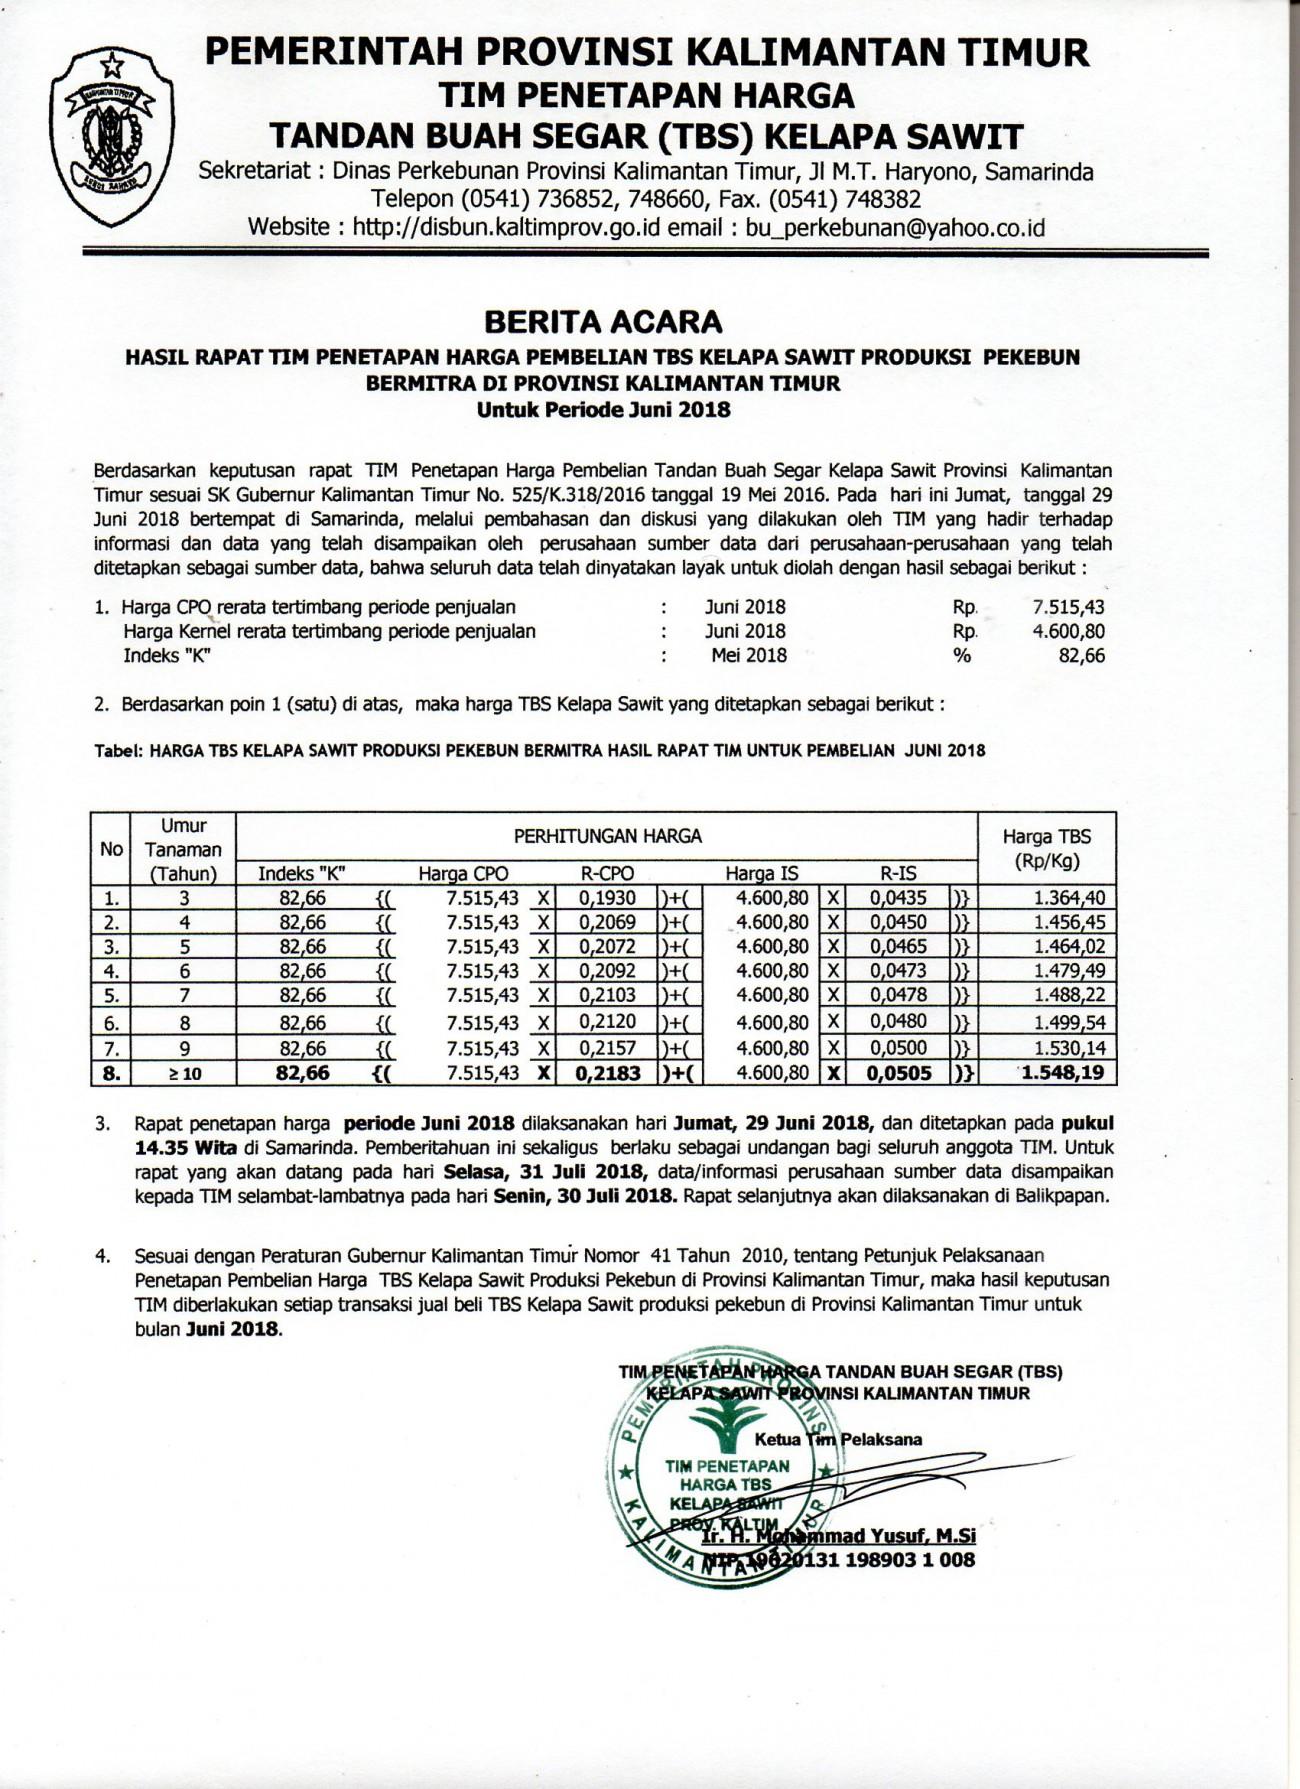 Informasi Harga TBS Kelapa Sawit Bulan Juni 2018